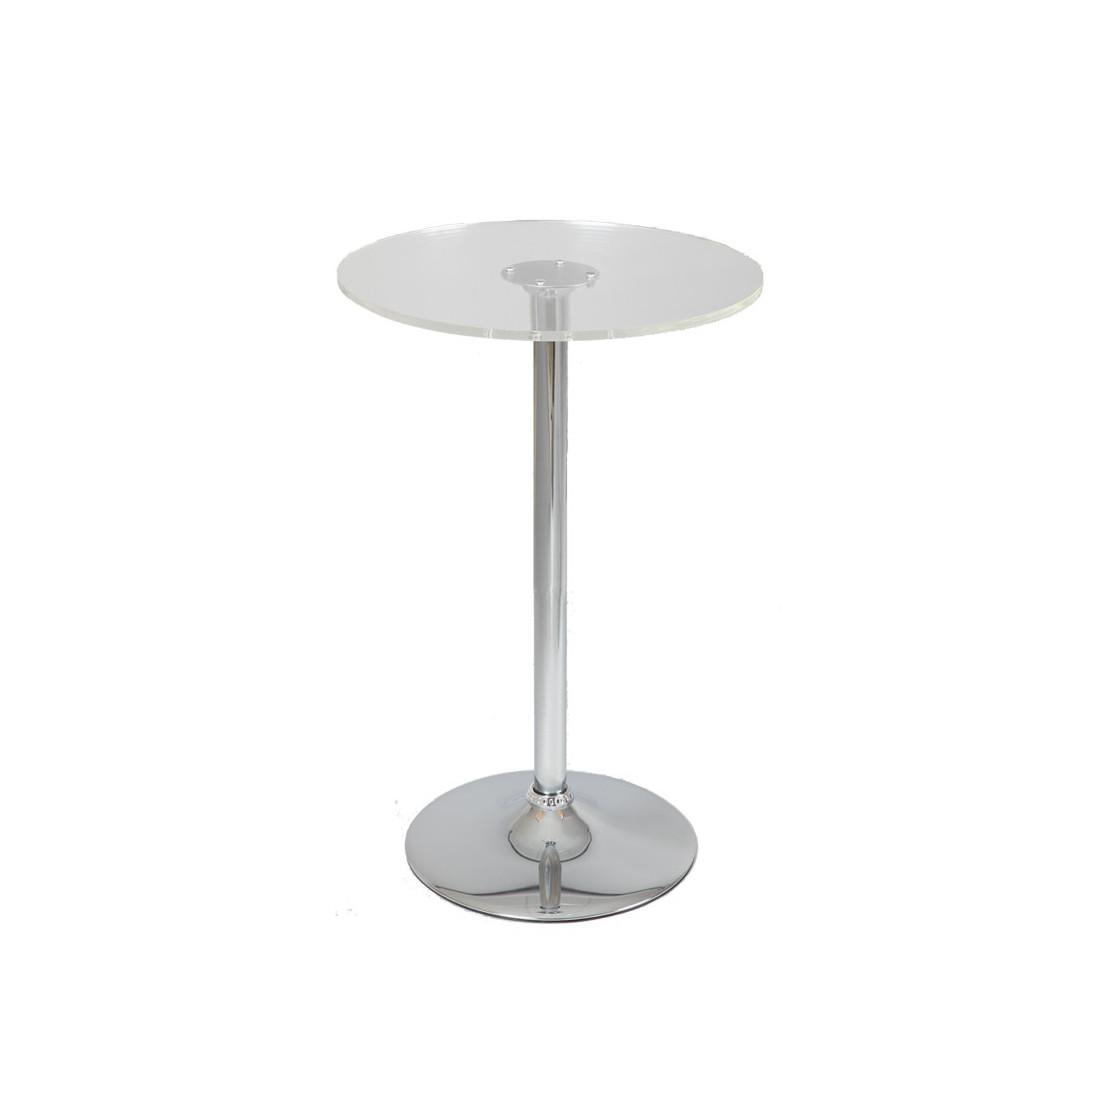 table de bistrot mange debout verre esta univers salon tousmesmeubles. Black Bedroom Furniture Sets. Home Design Ideas